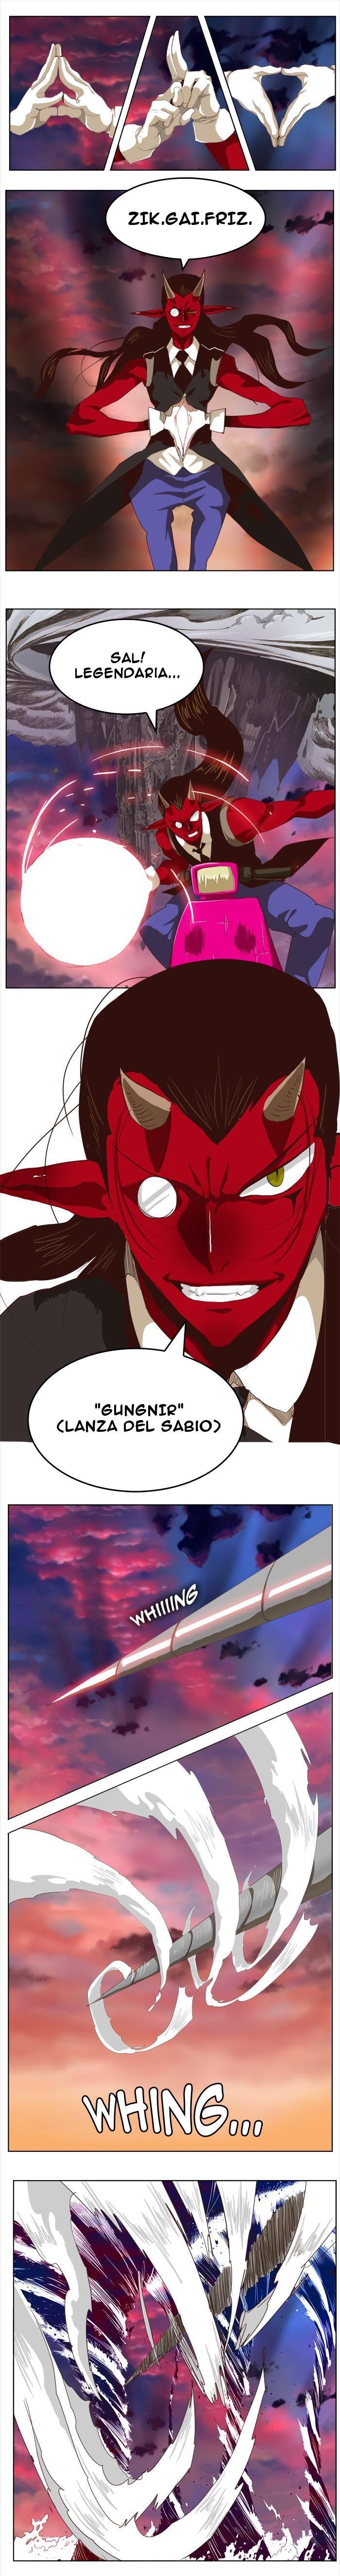 http://c5.ninemanga.com/es_manga/pic2/37/485/516376/35d5a39985f00d2f088dba07b918f875.jpg Page 9